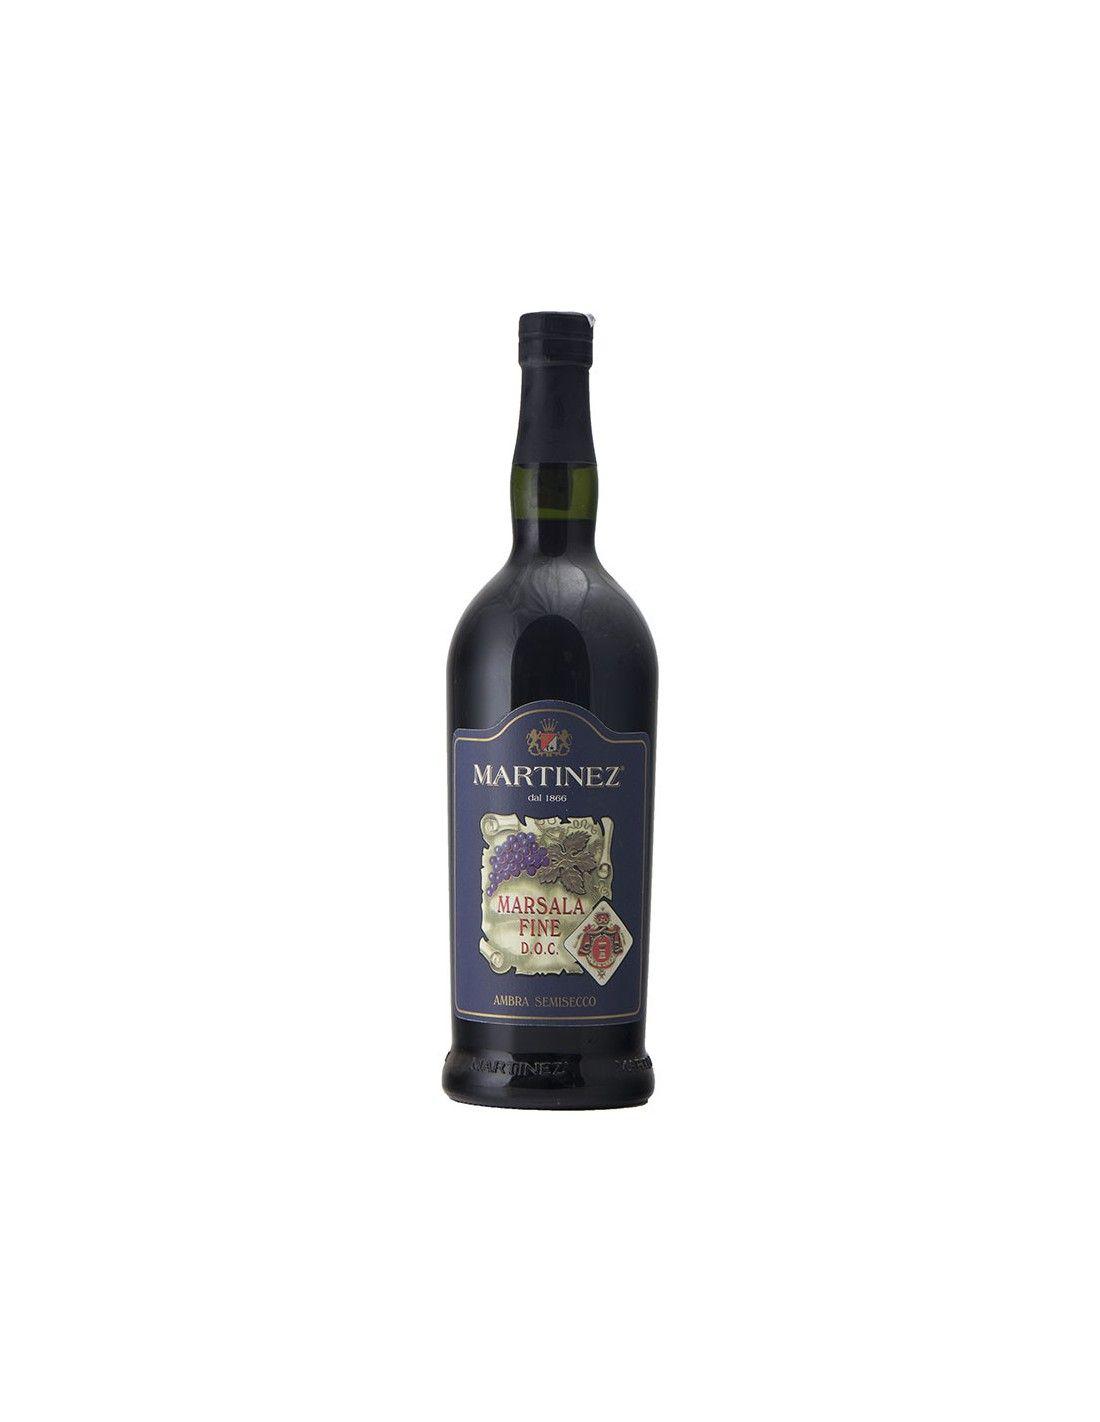 MARSALA FINE AMBRA SEMISECCO 75 CL NV MARTINEZ Grandi Bottiglie